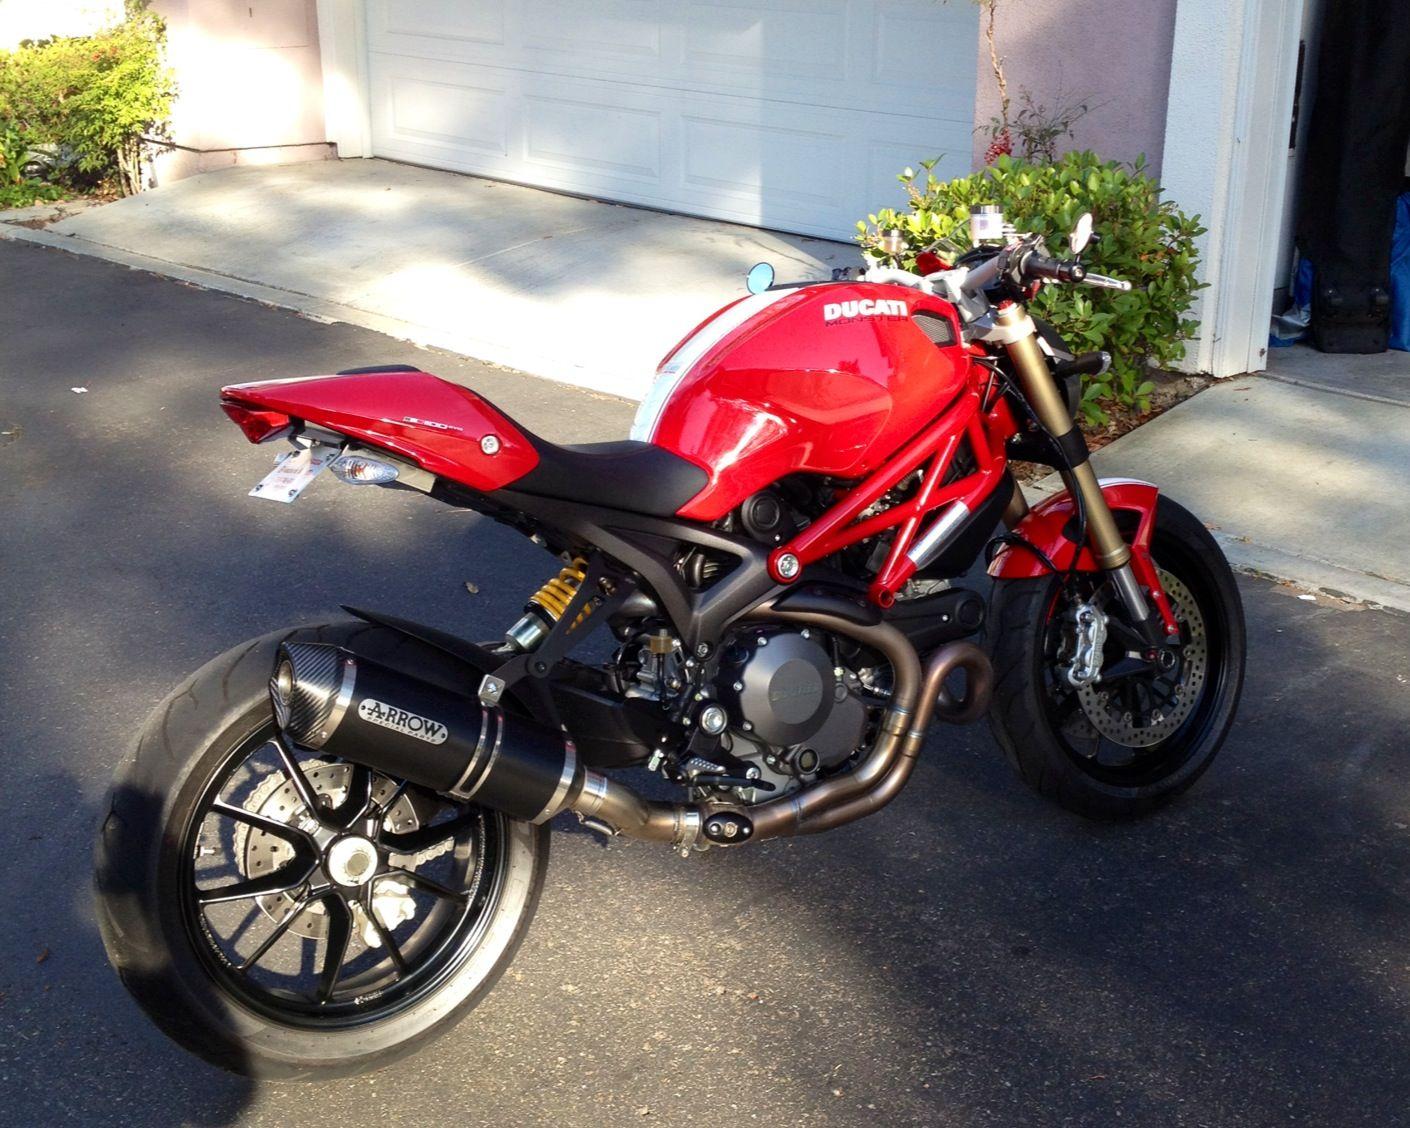 Ducati Monster 1100 EVO Reviews